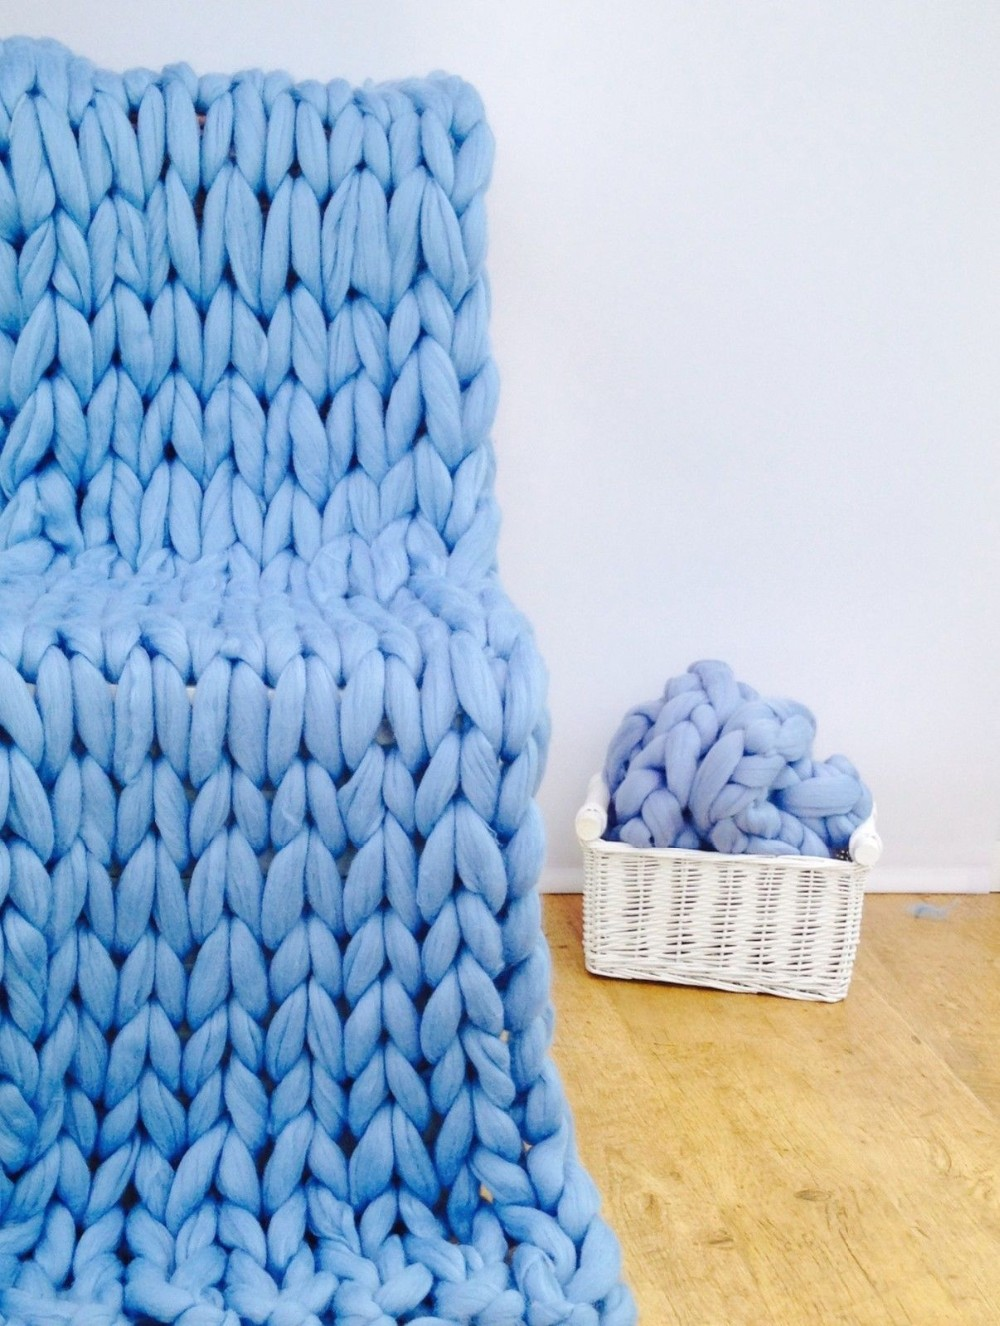 1 Kg/ball Super Chunky Thick Merino Wool Yarn For Hand Knitting ...